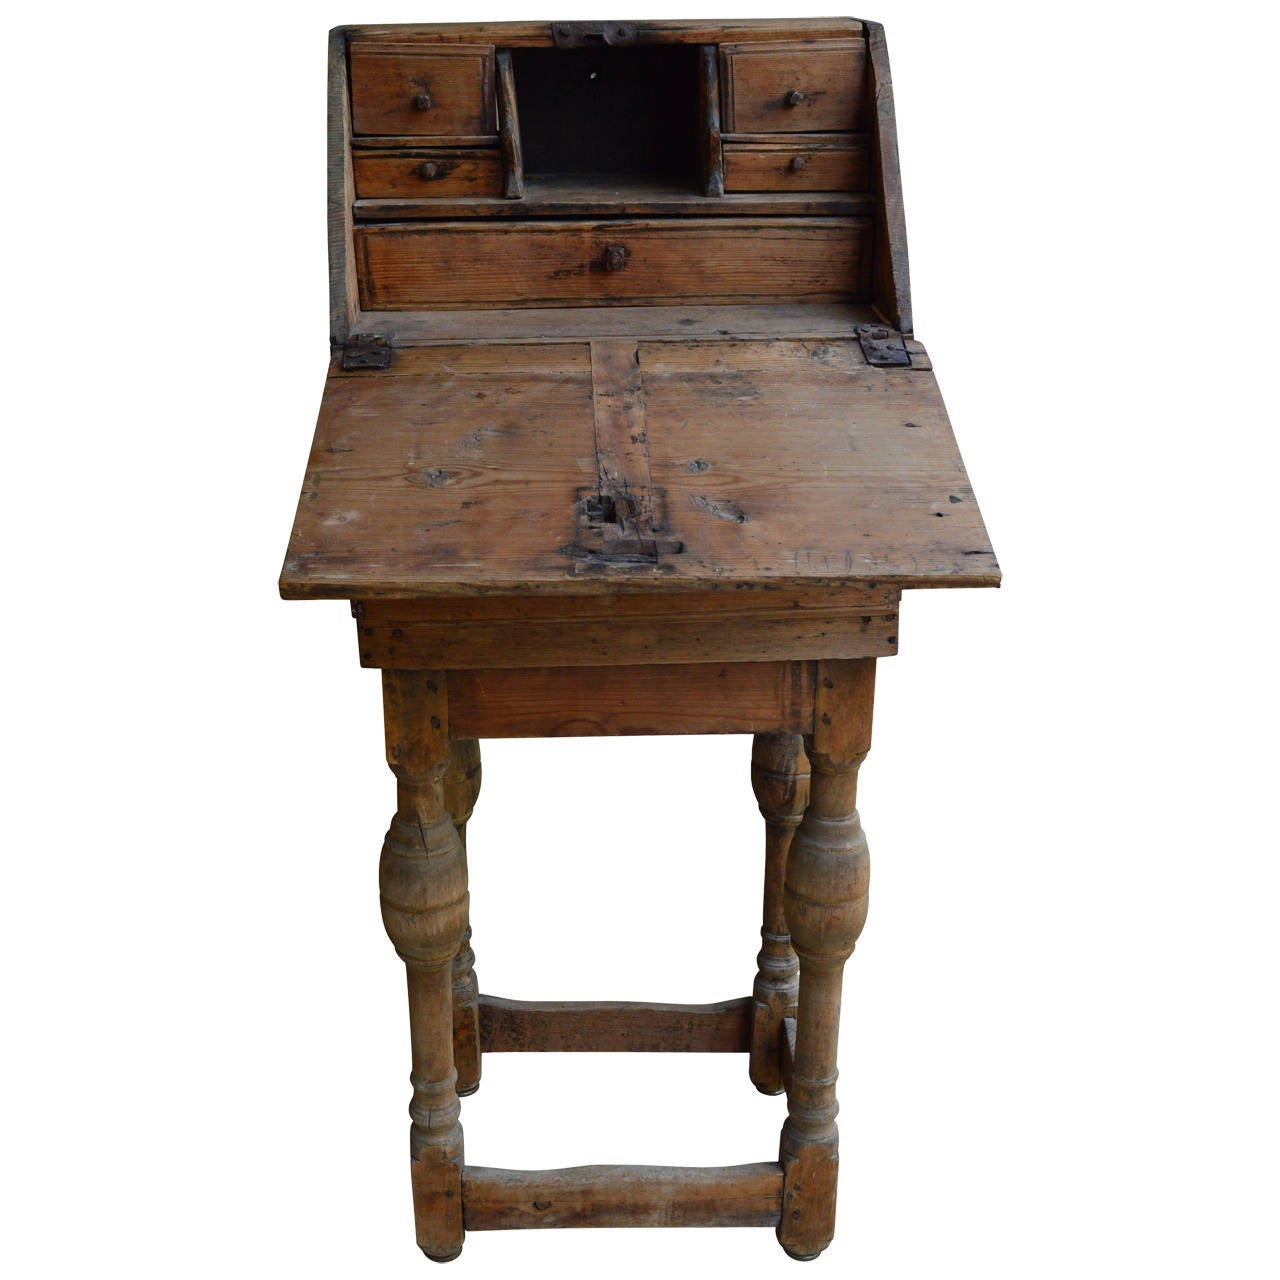 Small Drop Front Desk Small Drop Front Desk With  : CPDSC0048l from amlibgroup.com size 1280 x 1280 jpeg 105kB